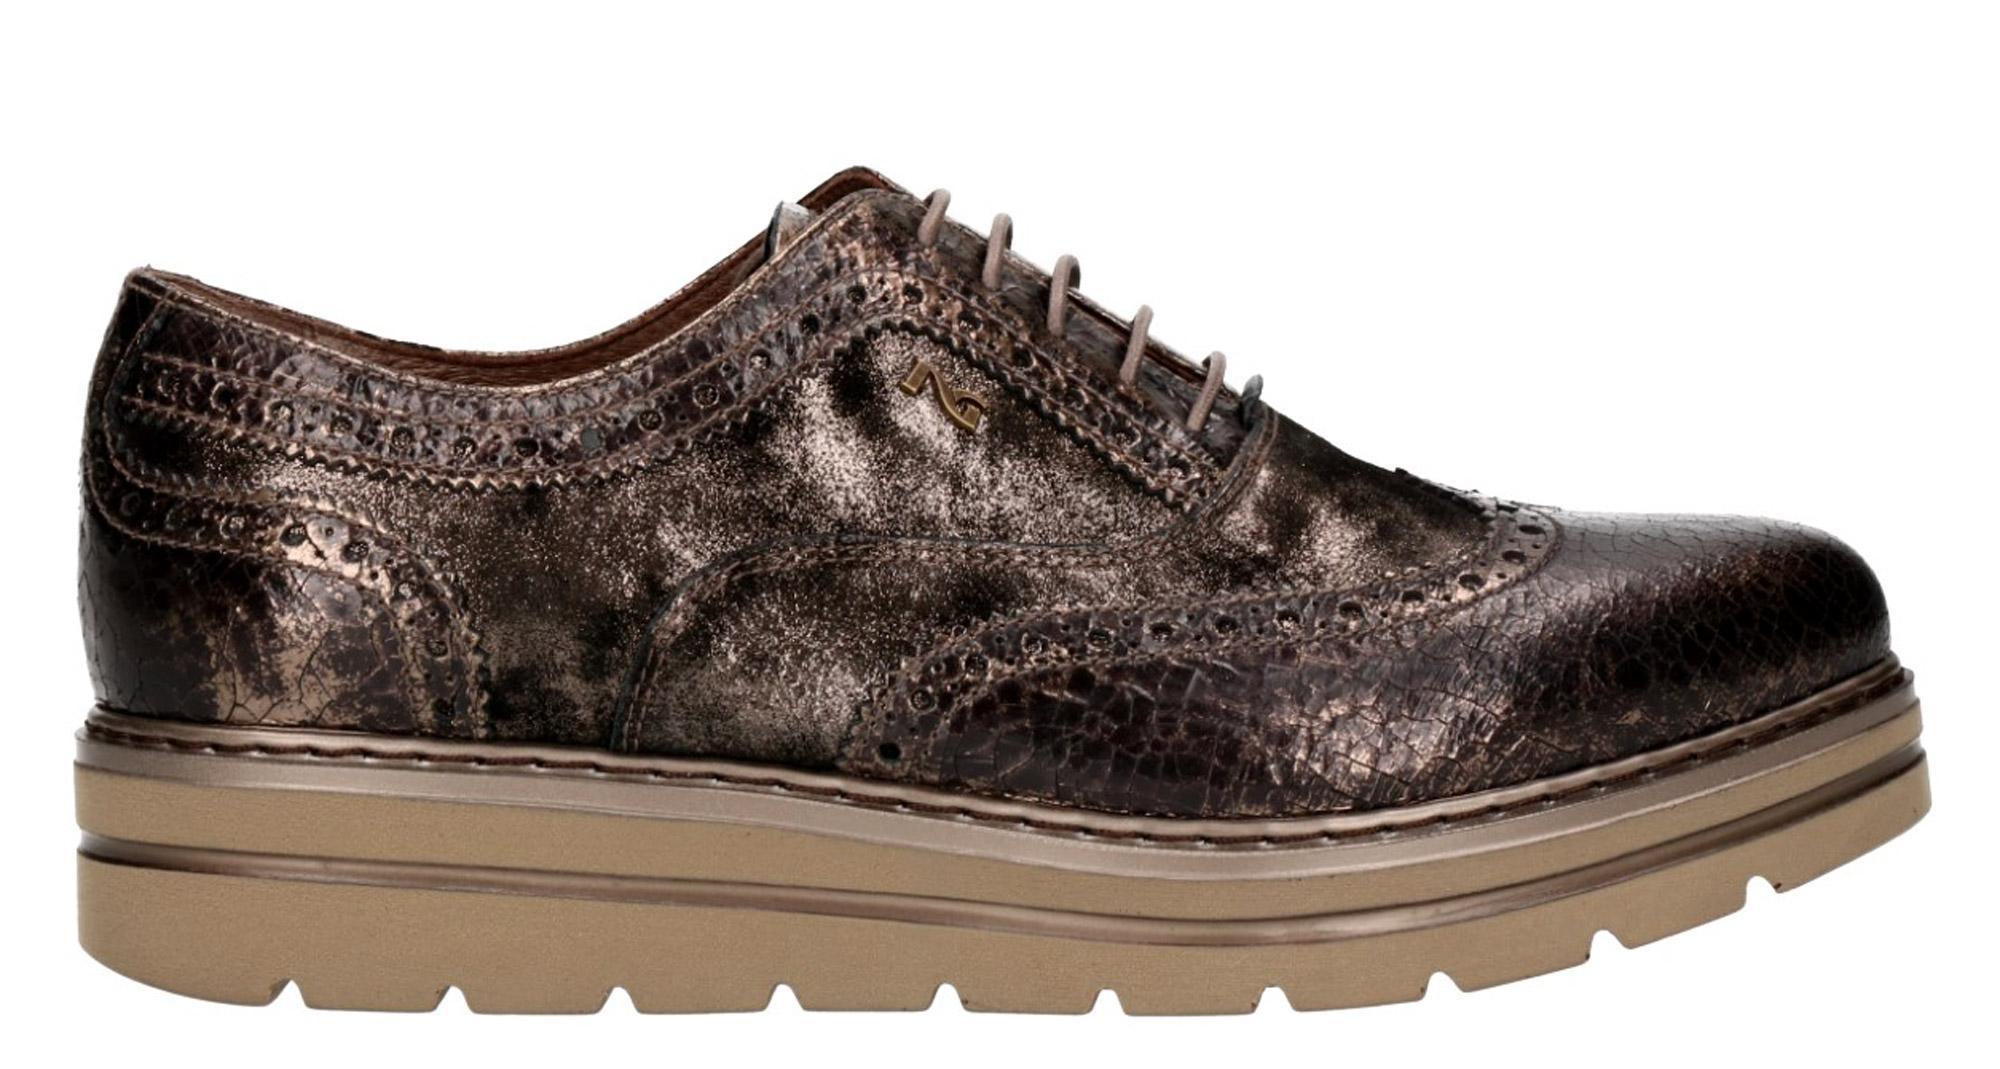 Francesine NeroGiardini P806371-312 6371 scarpe stringate bronzo donna con  platform 80ef5ba71a5